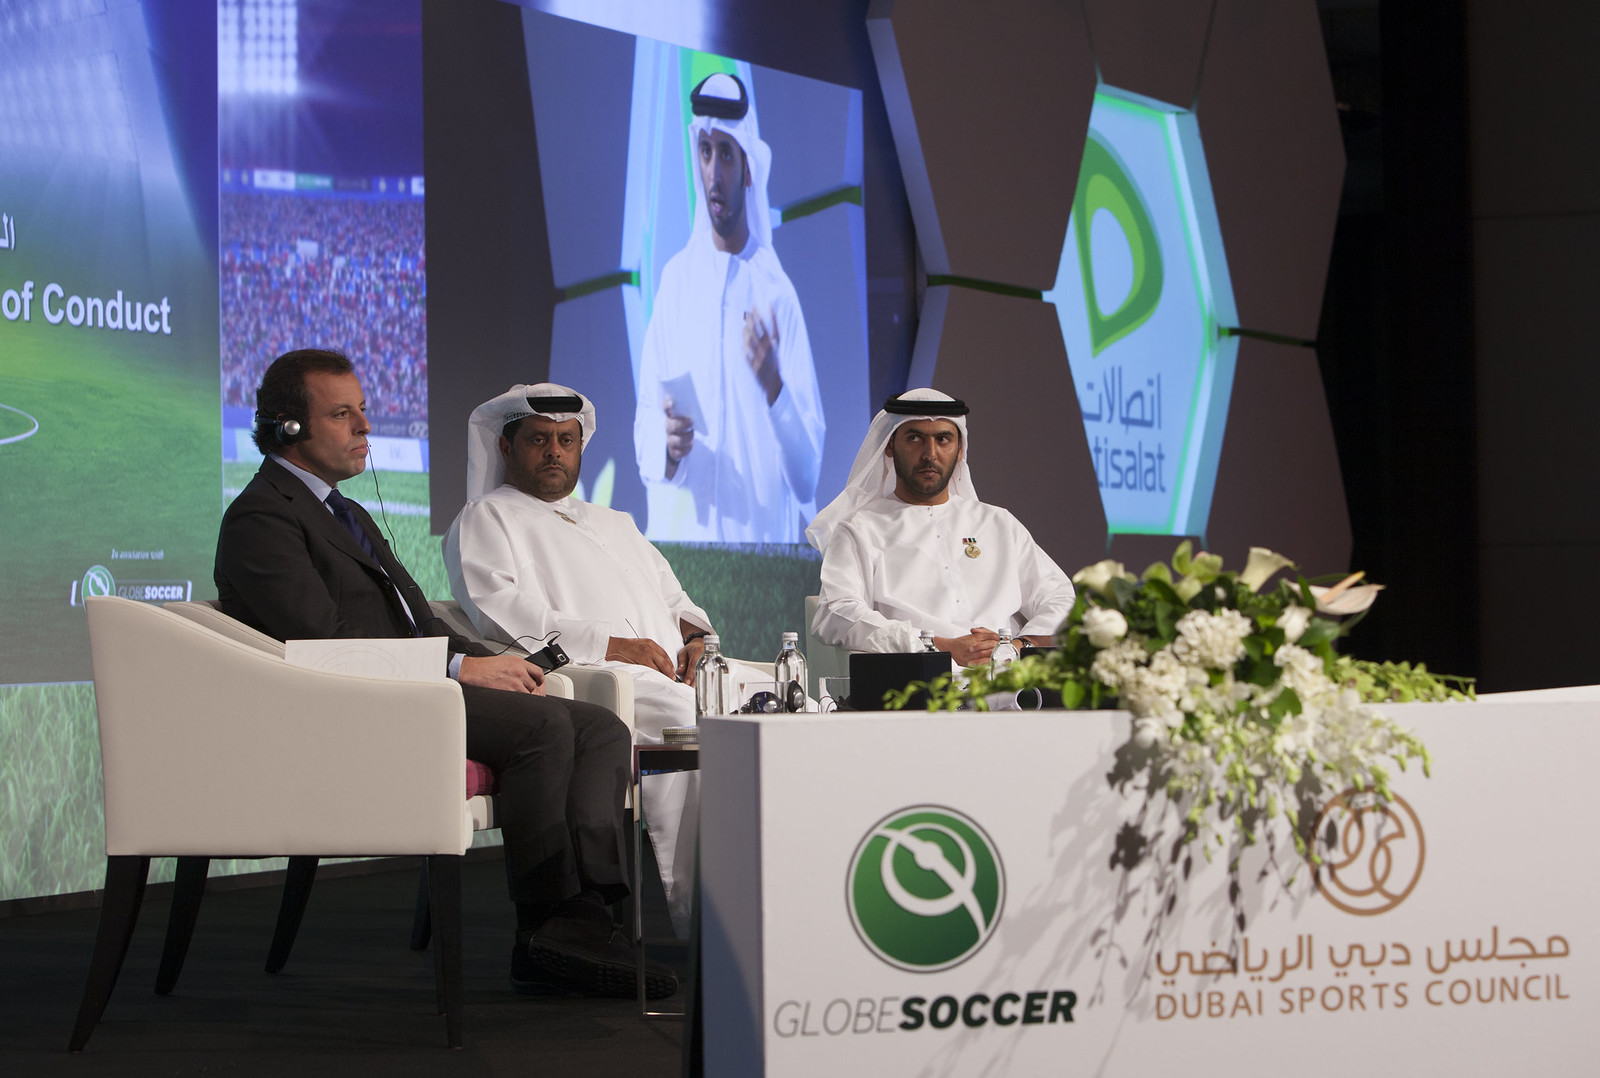 Sandro Rosell, Mohammed Thani Al Rumaithi and Abdullah Al Nabooda